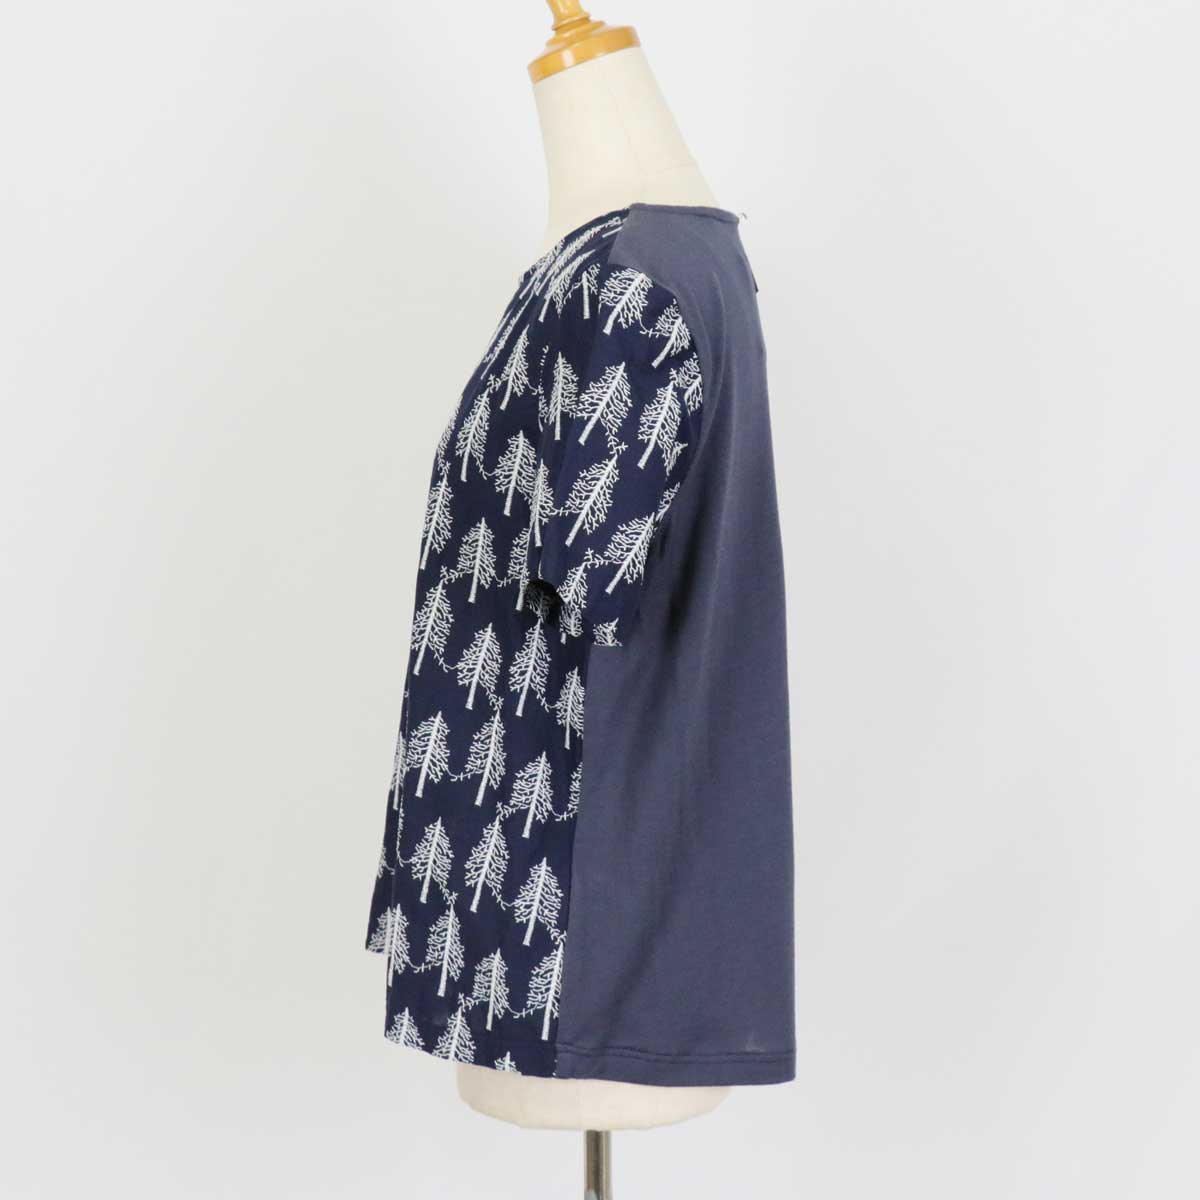 ≪SALE・20パーセントオフ≫ Fanuil ファヌル プルオーバー ウッド刺繍 プルオーバー ブラウス